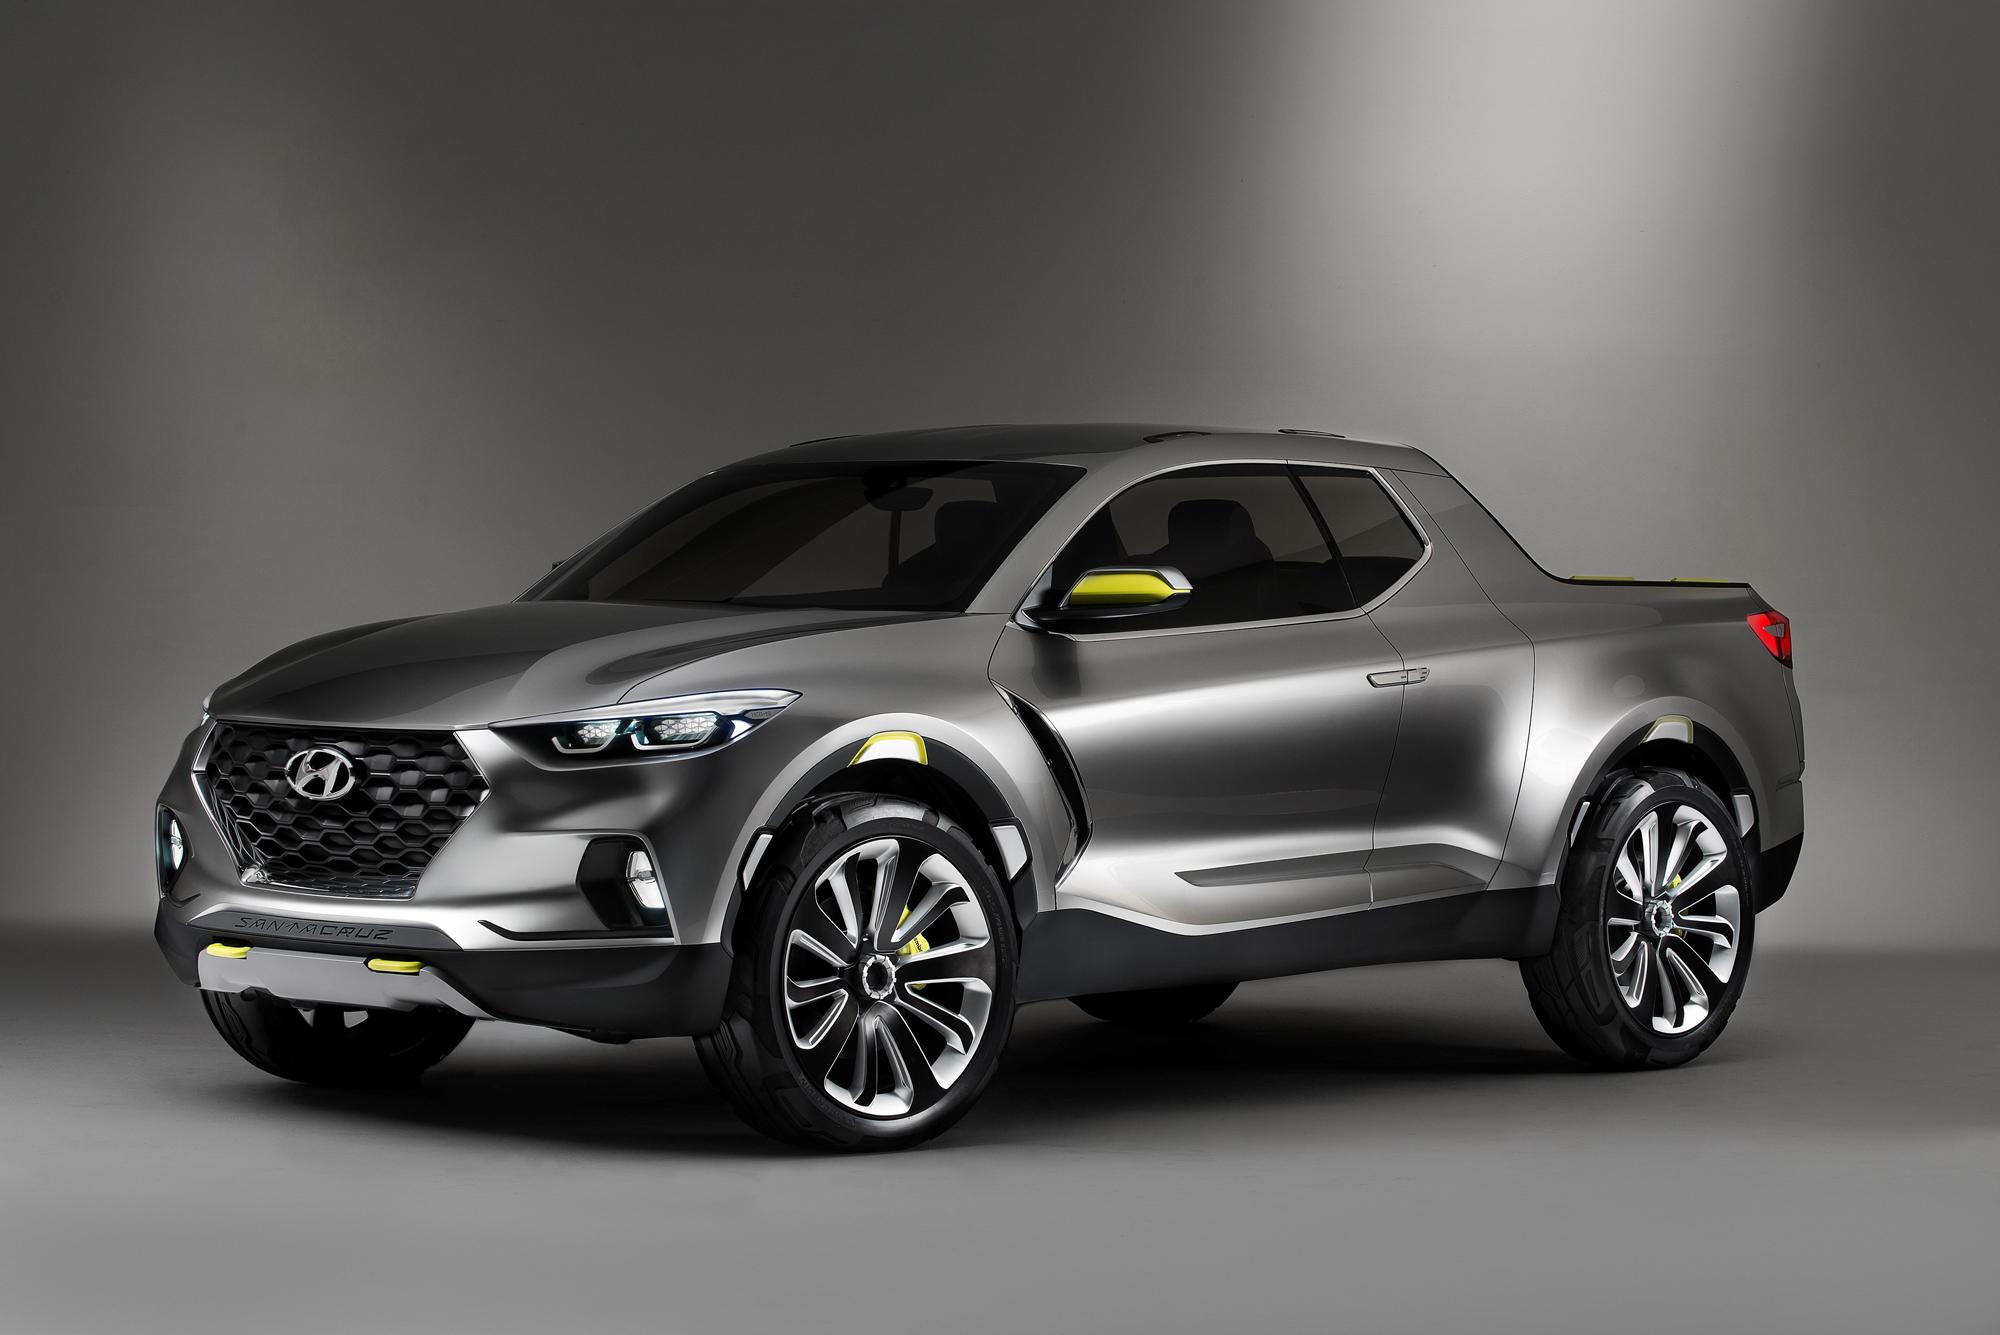 Hyundai Santa Cruz due in 2020